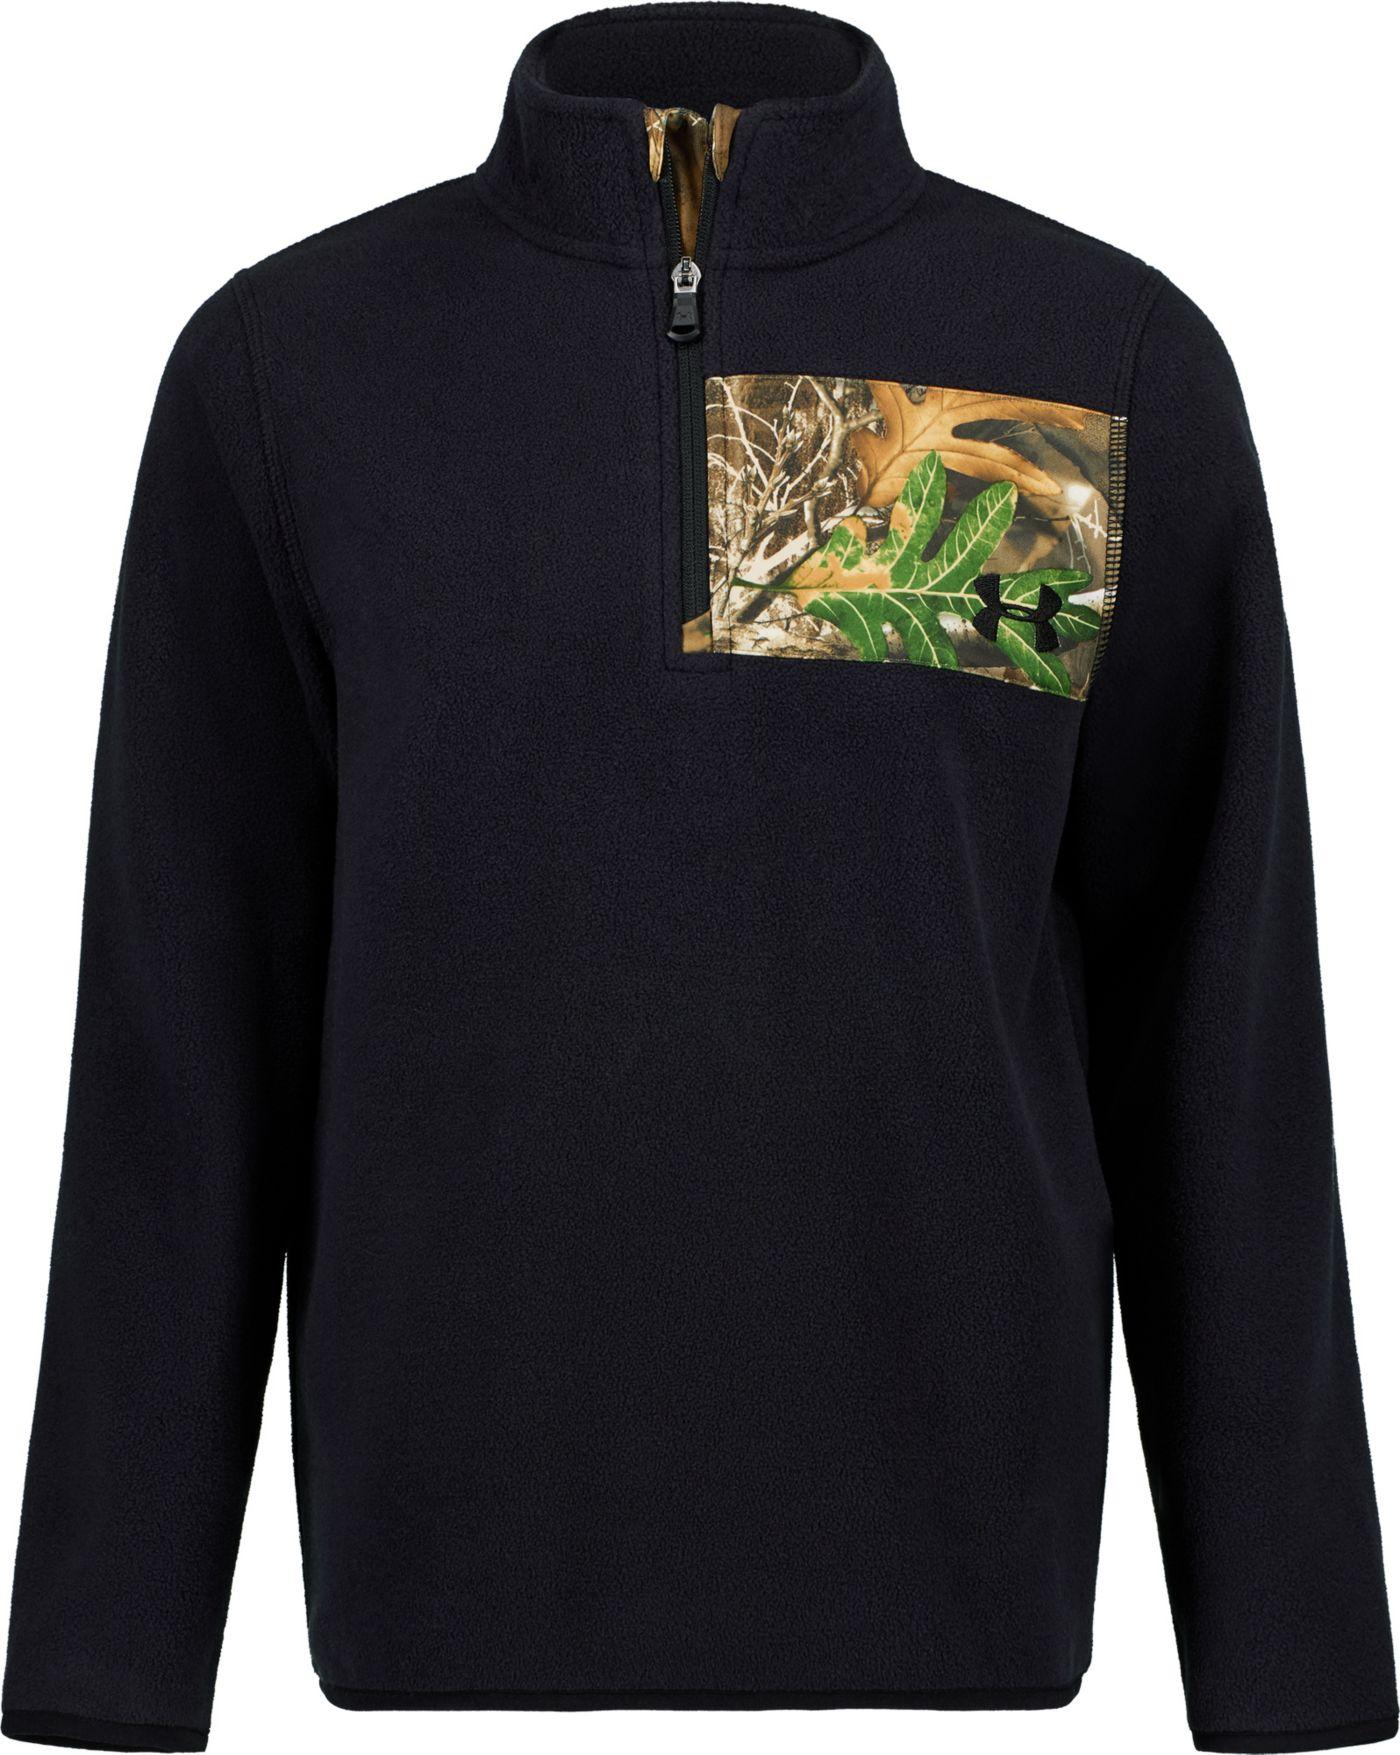 Under Armour Boys' Real Tree Edge Camp 1/4 Zip Long Sleeve Fleece Jacket